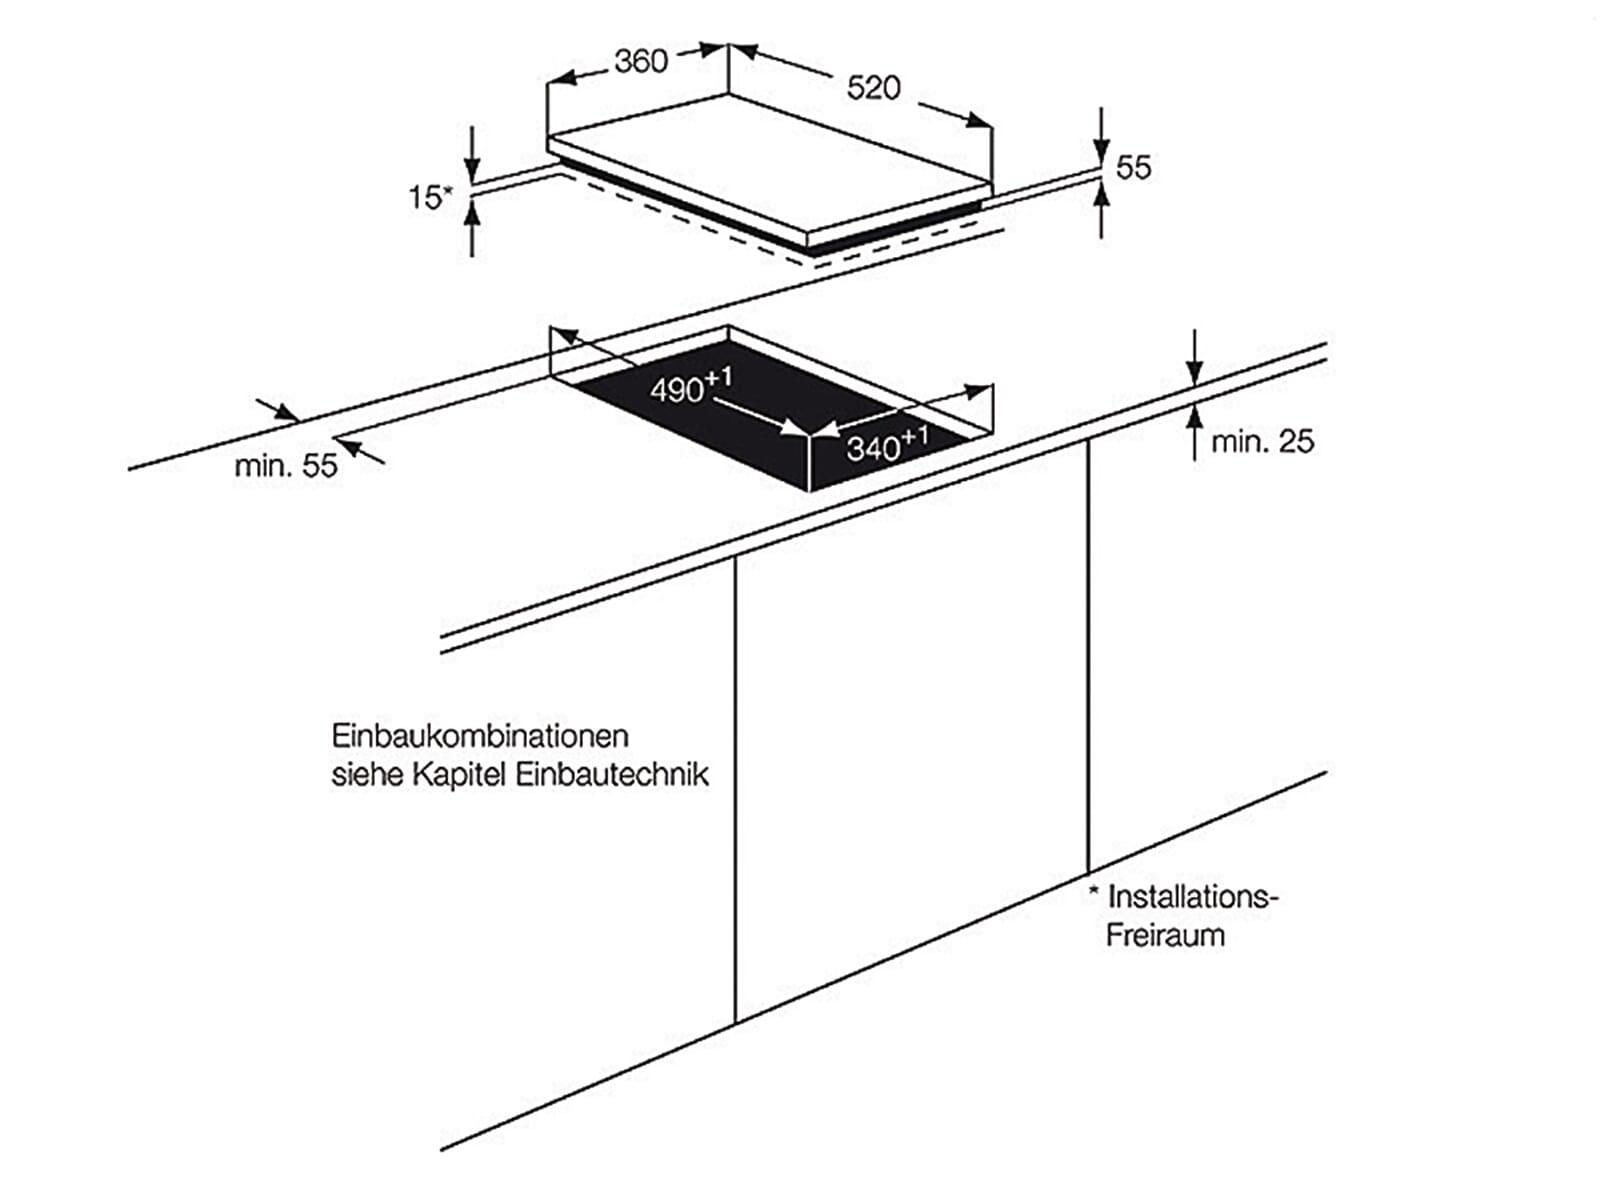 aeg hc452401eb domino induktionskochfeld autark. Black Bedroom Furniture Sets. Home Design Ideas